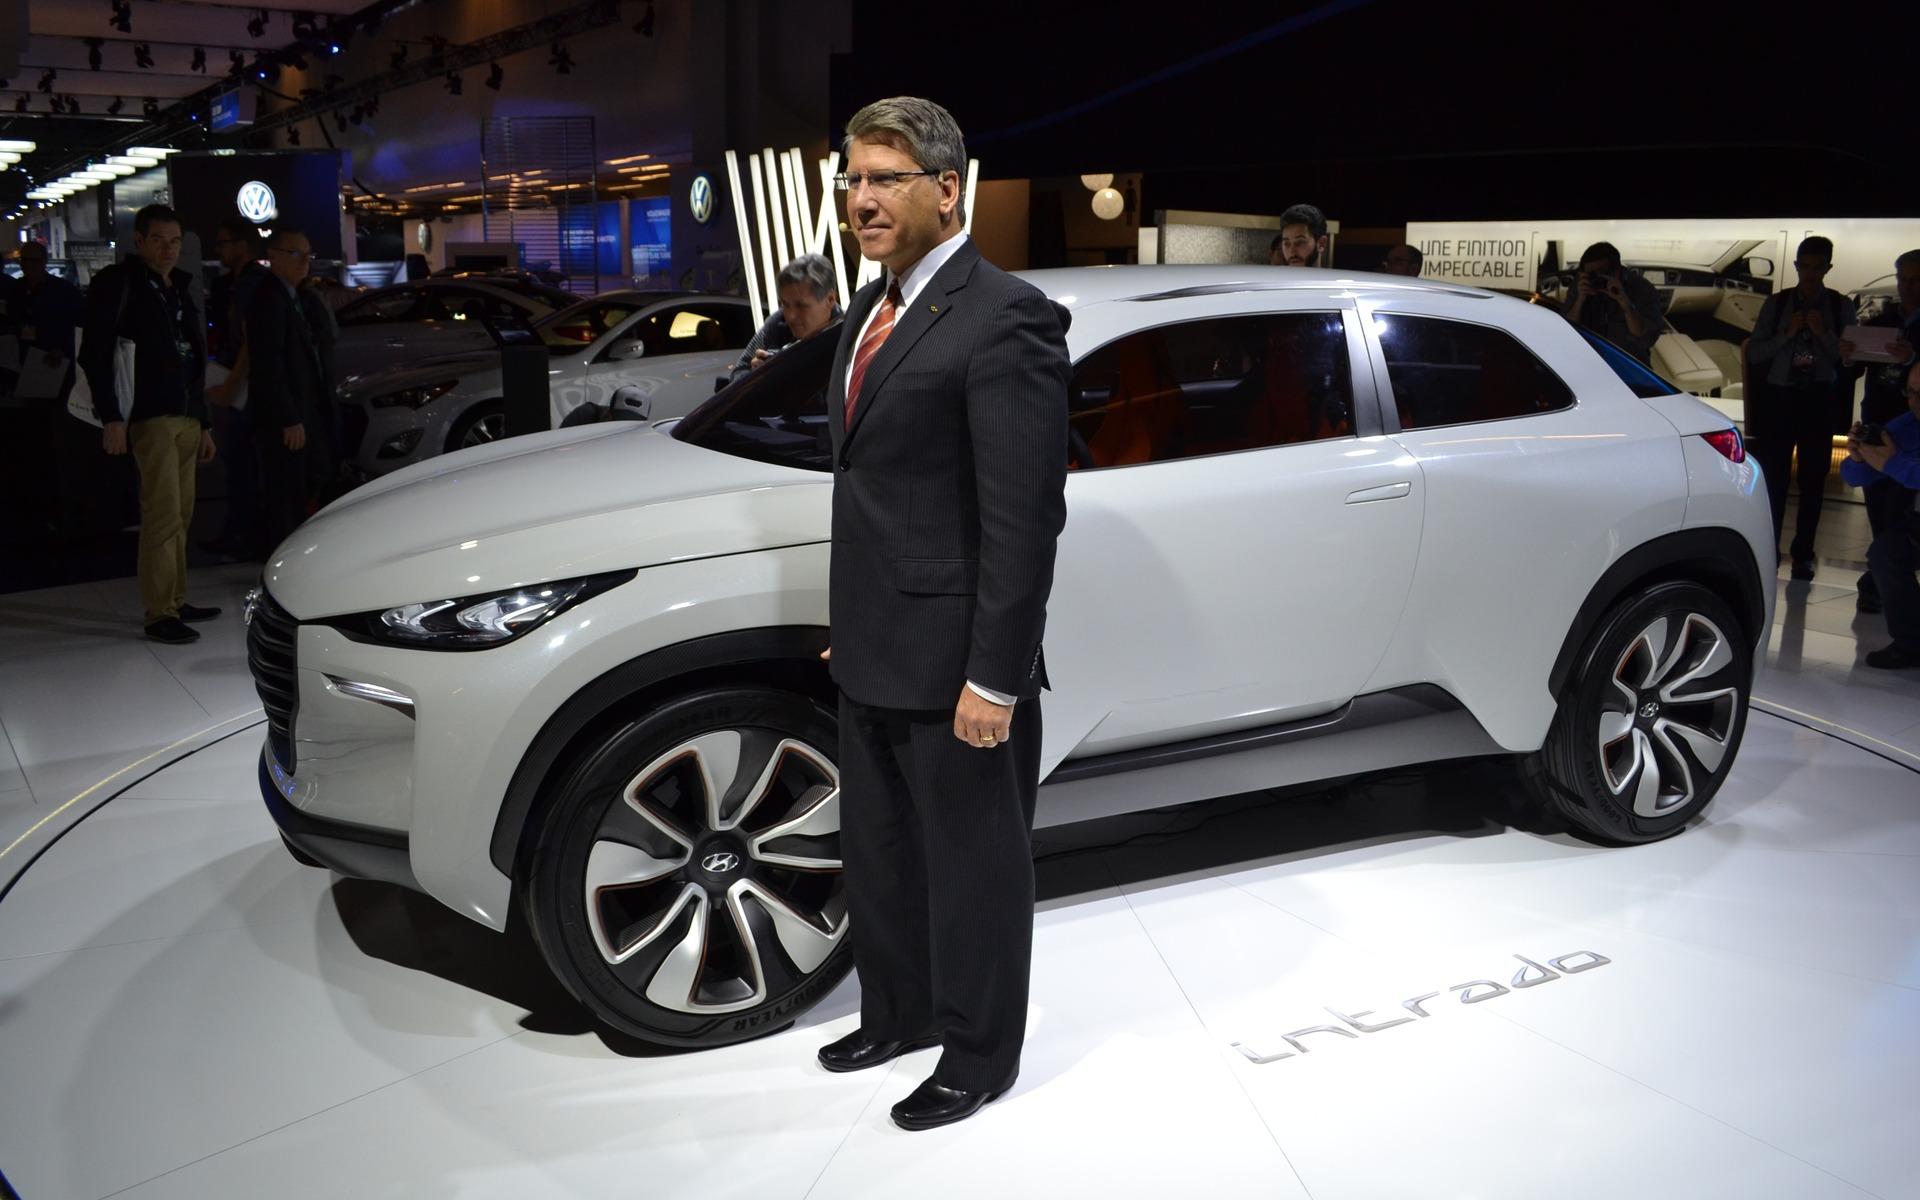 Hyundai Intrado Concept: Après Genève, Montréal! - Hyundai Concept ...